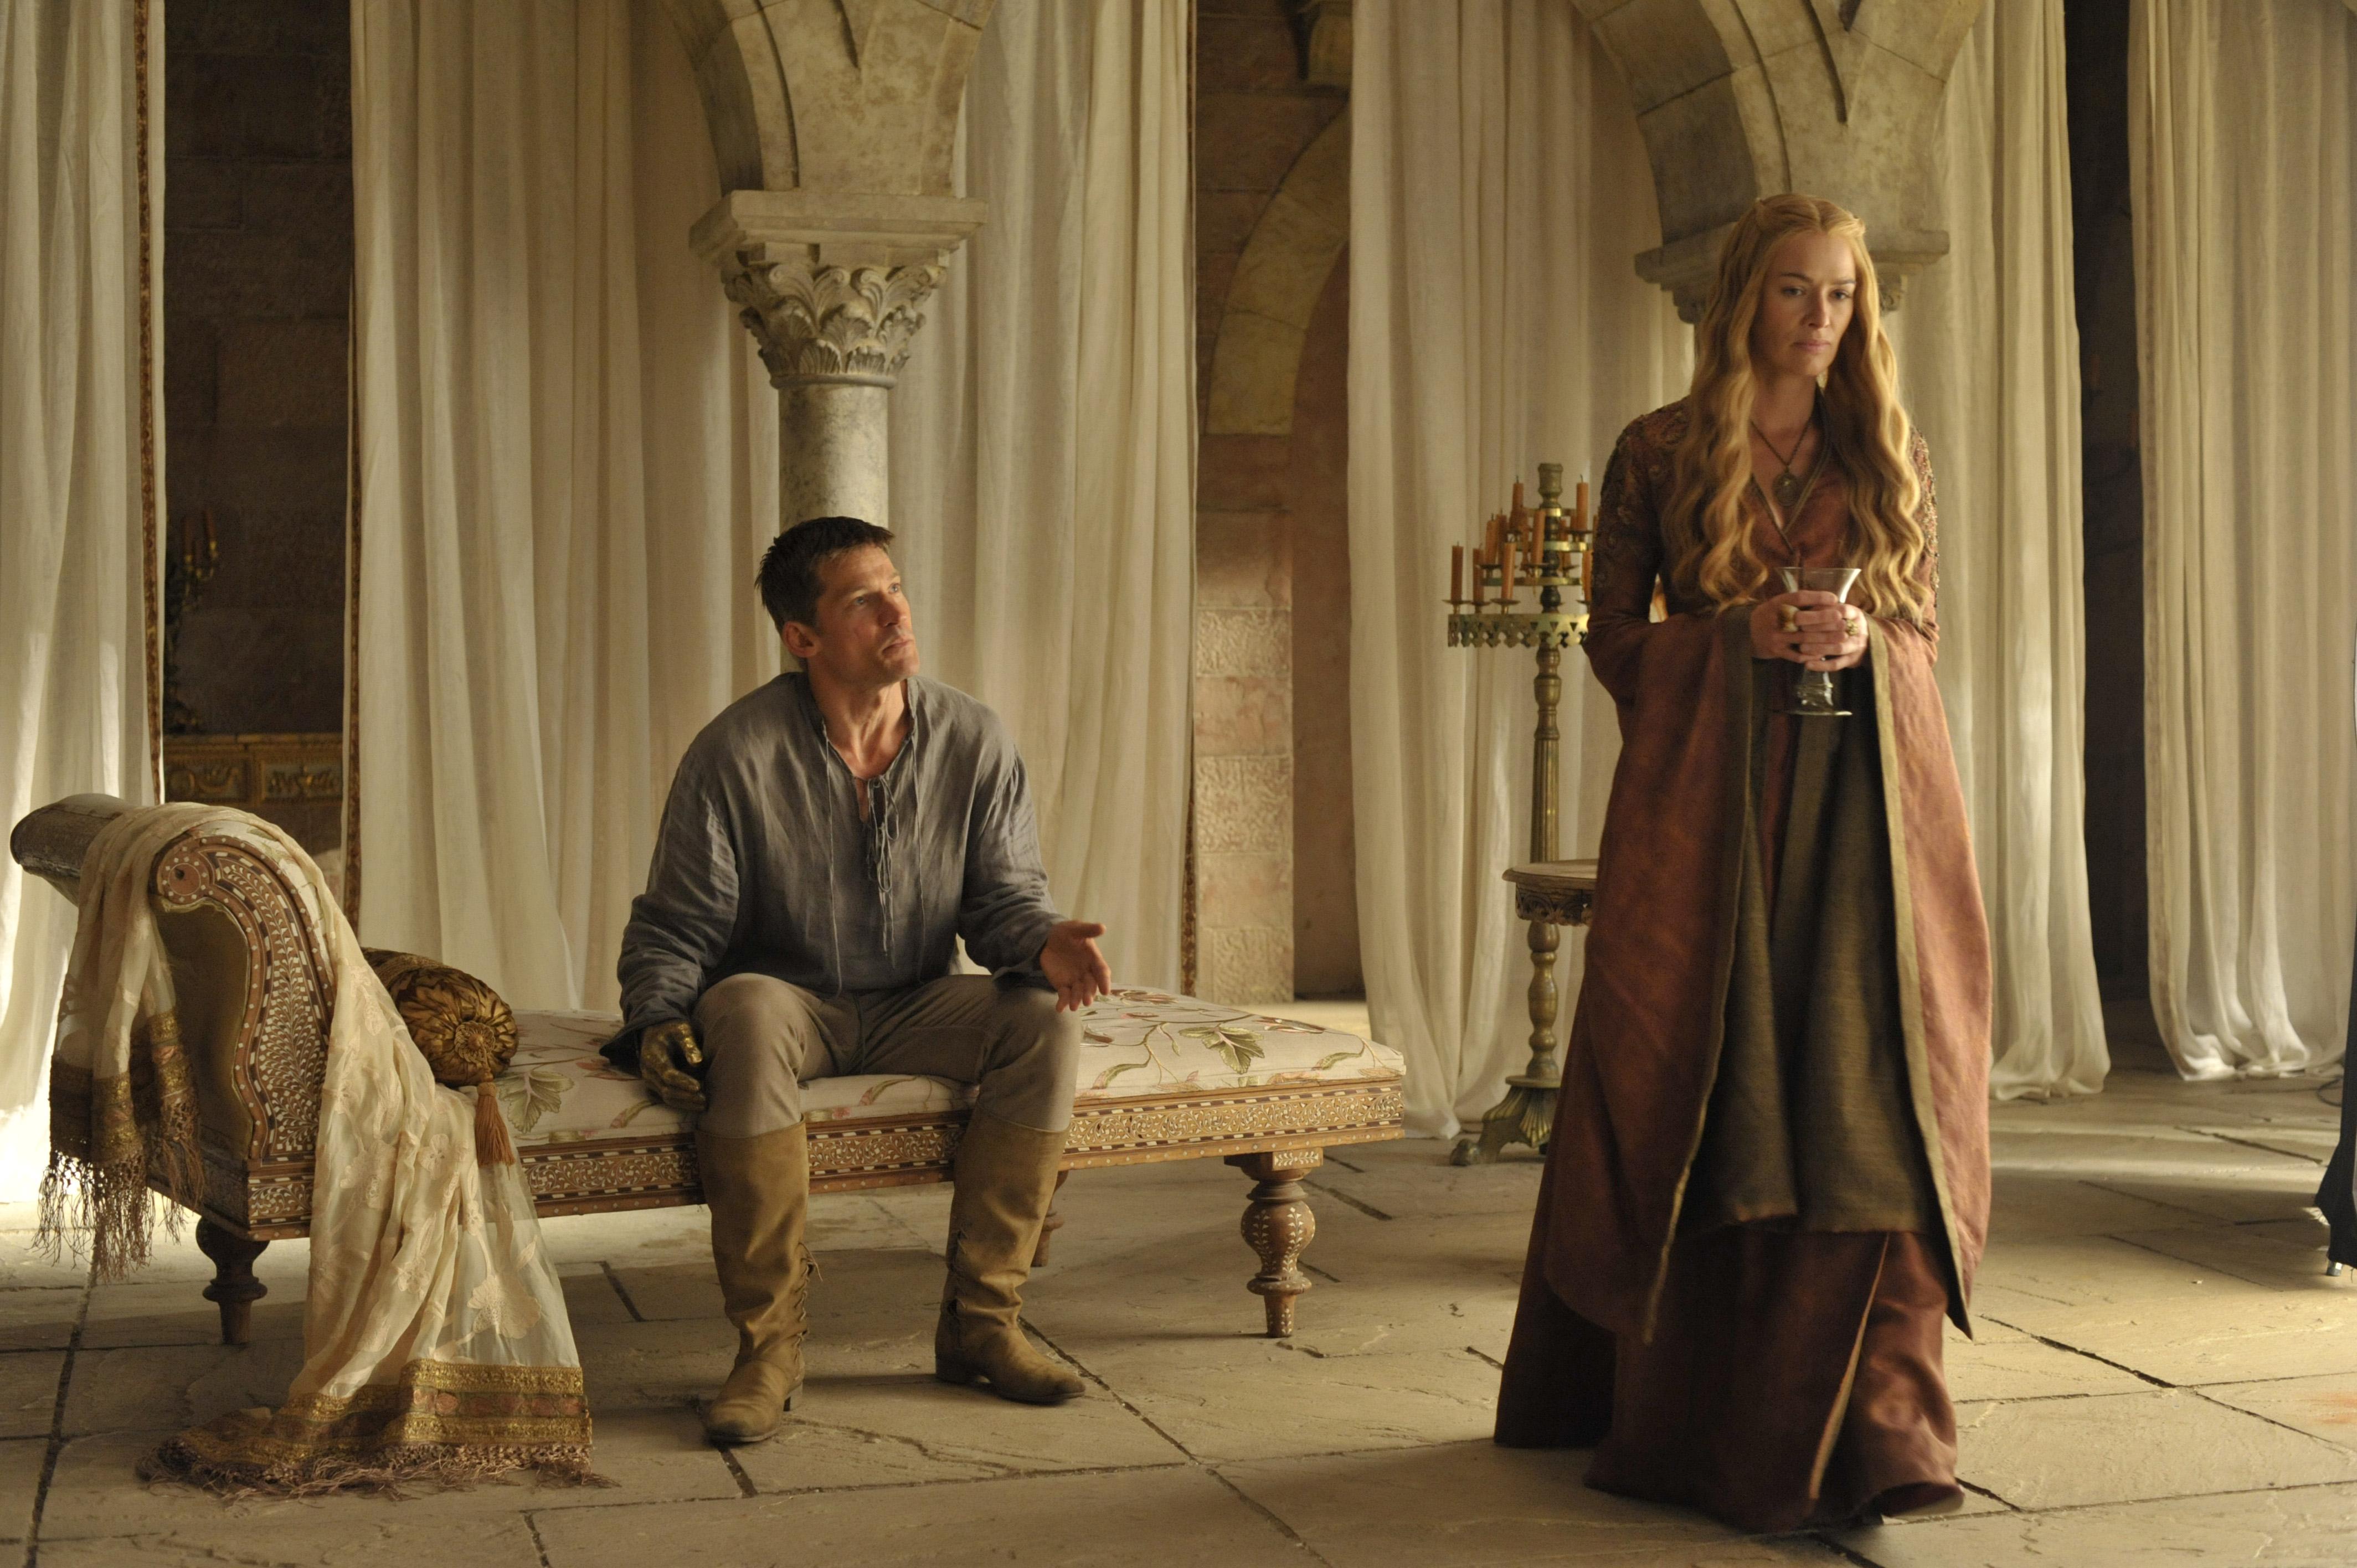 Nikolaj Coster-Waldau and Lena Headey on Game of Thrones